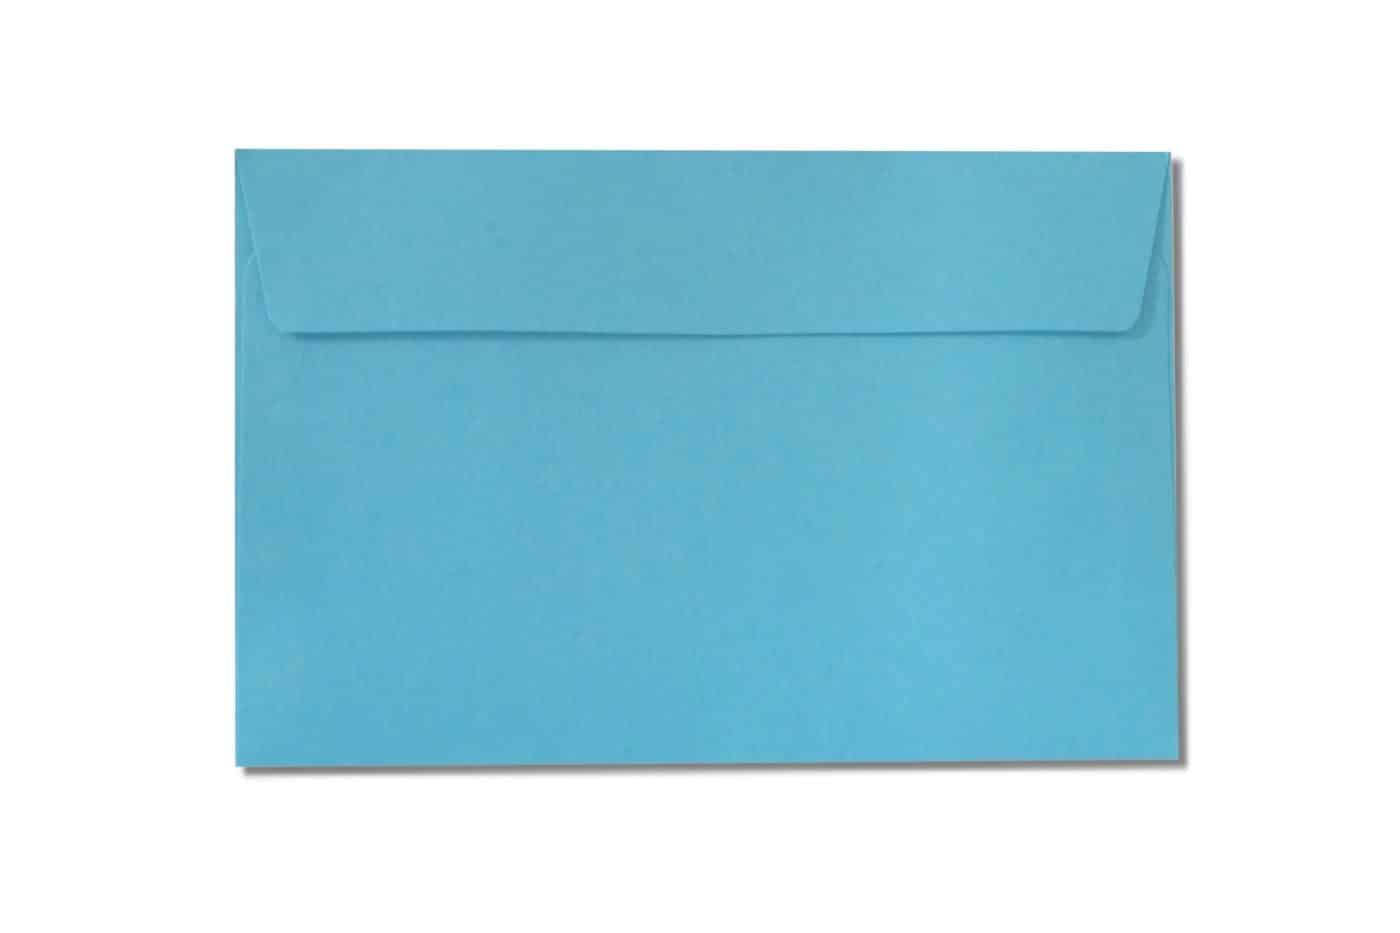 c6 c5 blue envelopes 110gsm